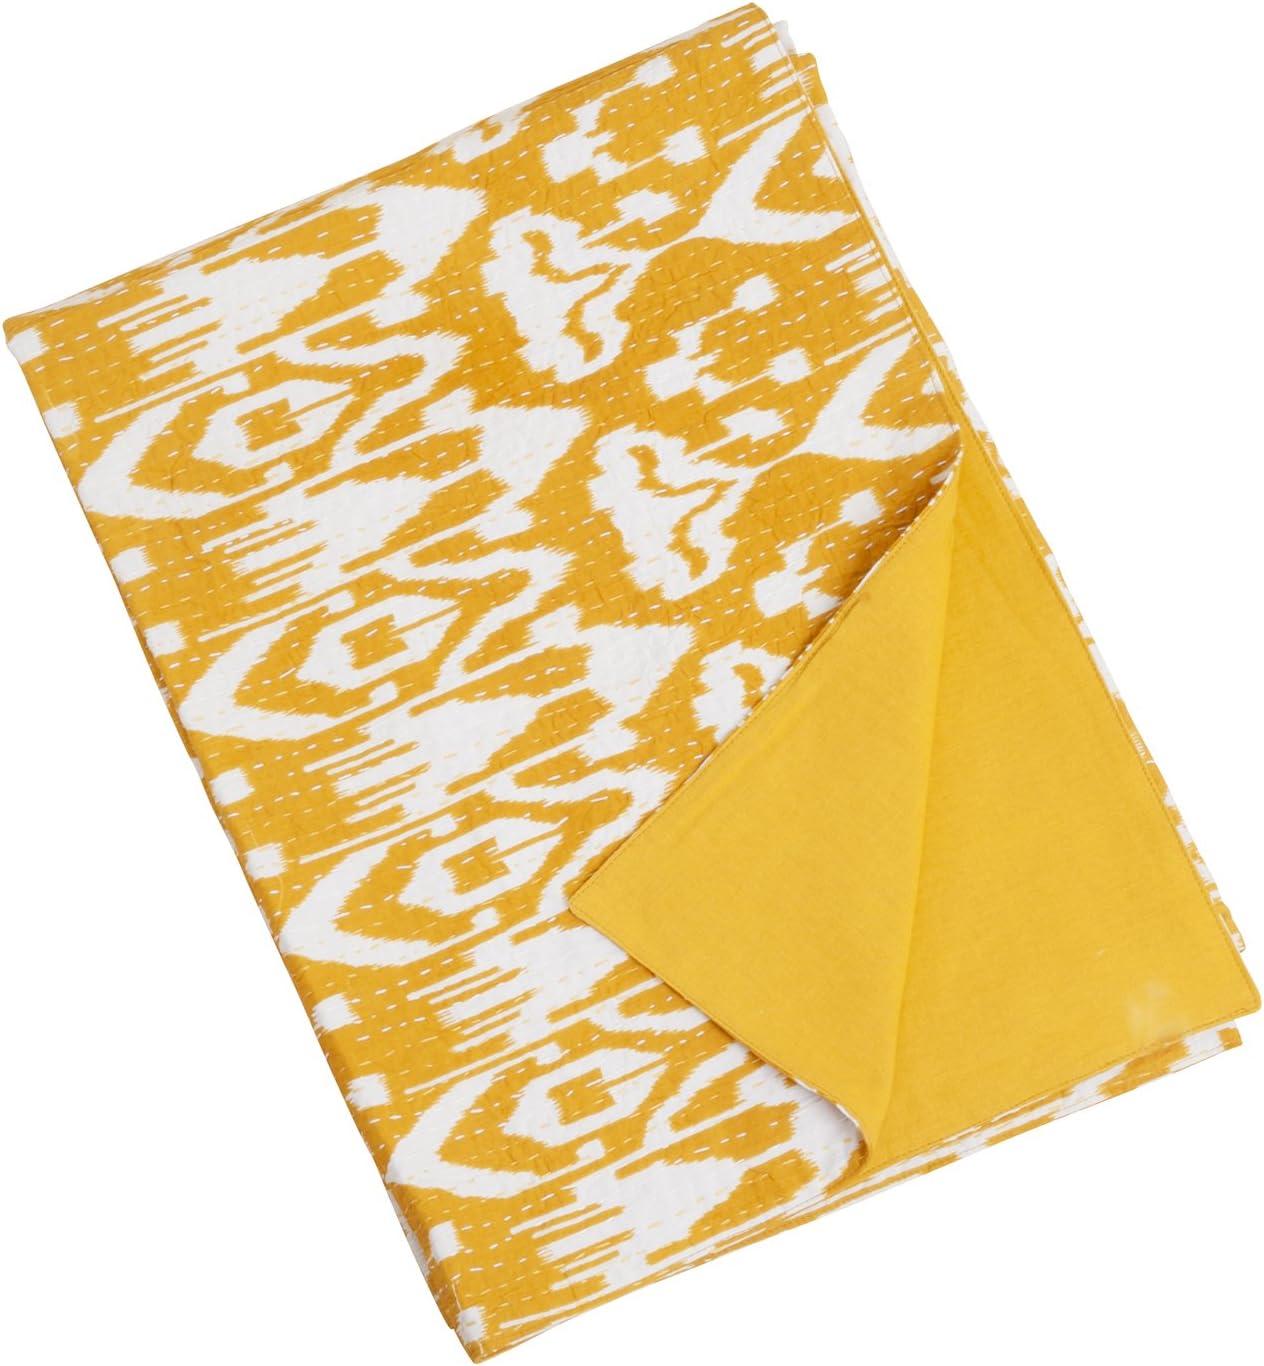 Mustard SARO LIFESTYLE TH517 1-Piece Asha Ikat Throw 40 by 60-Inch